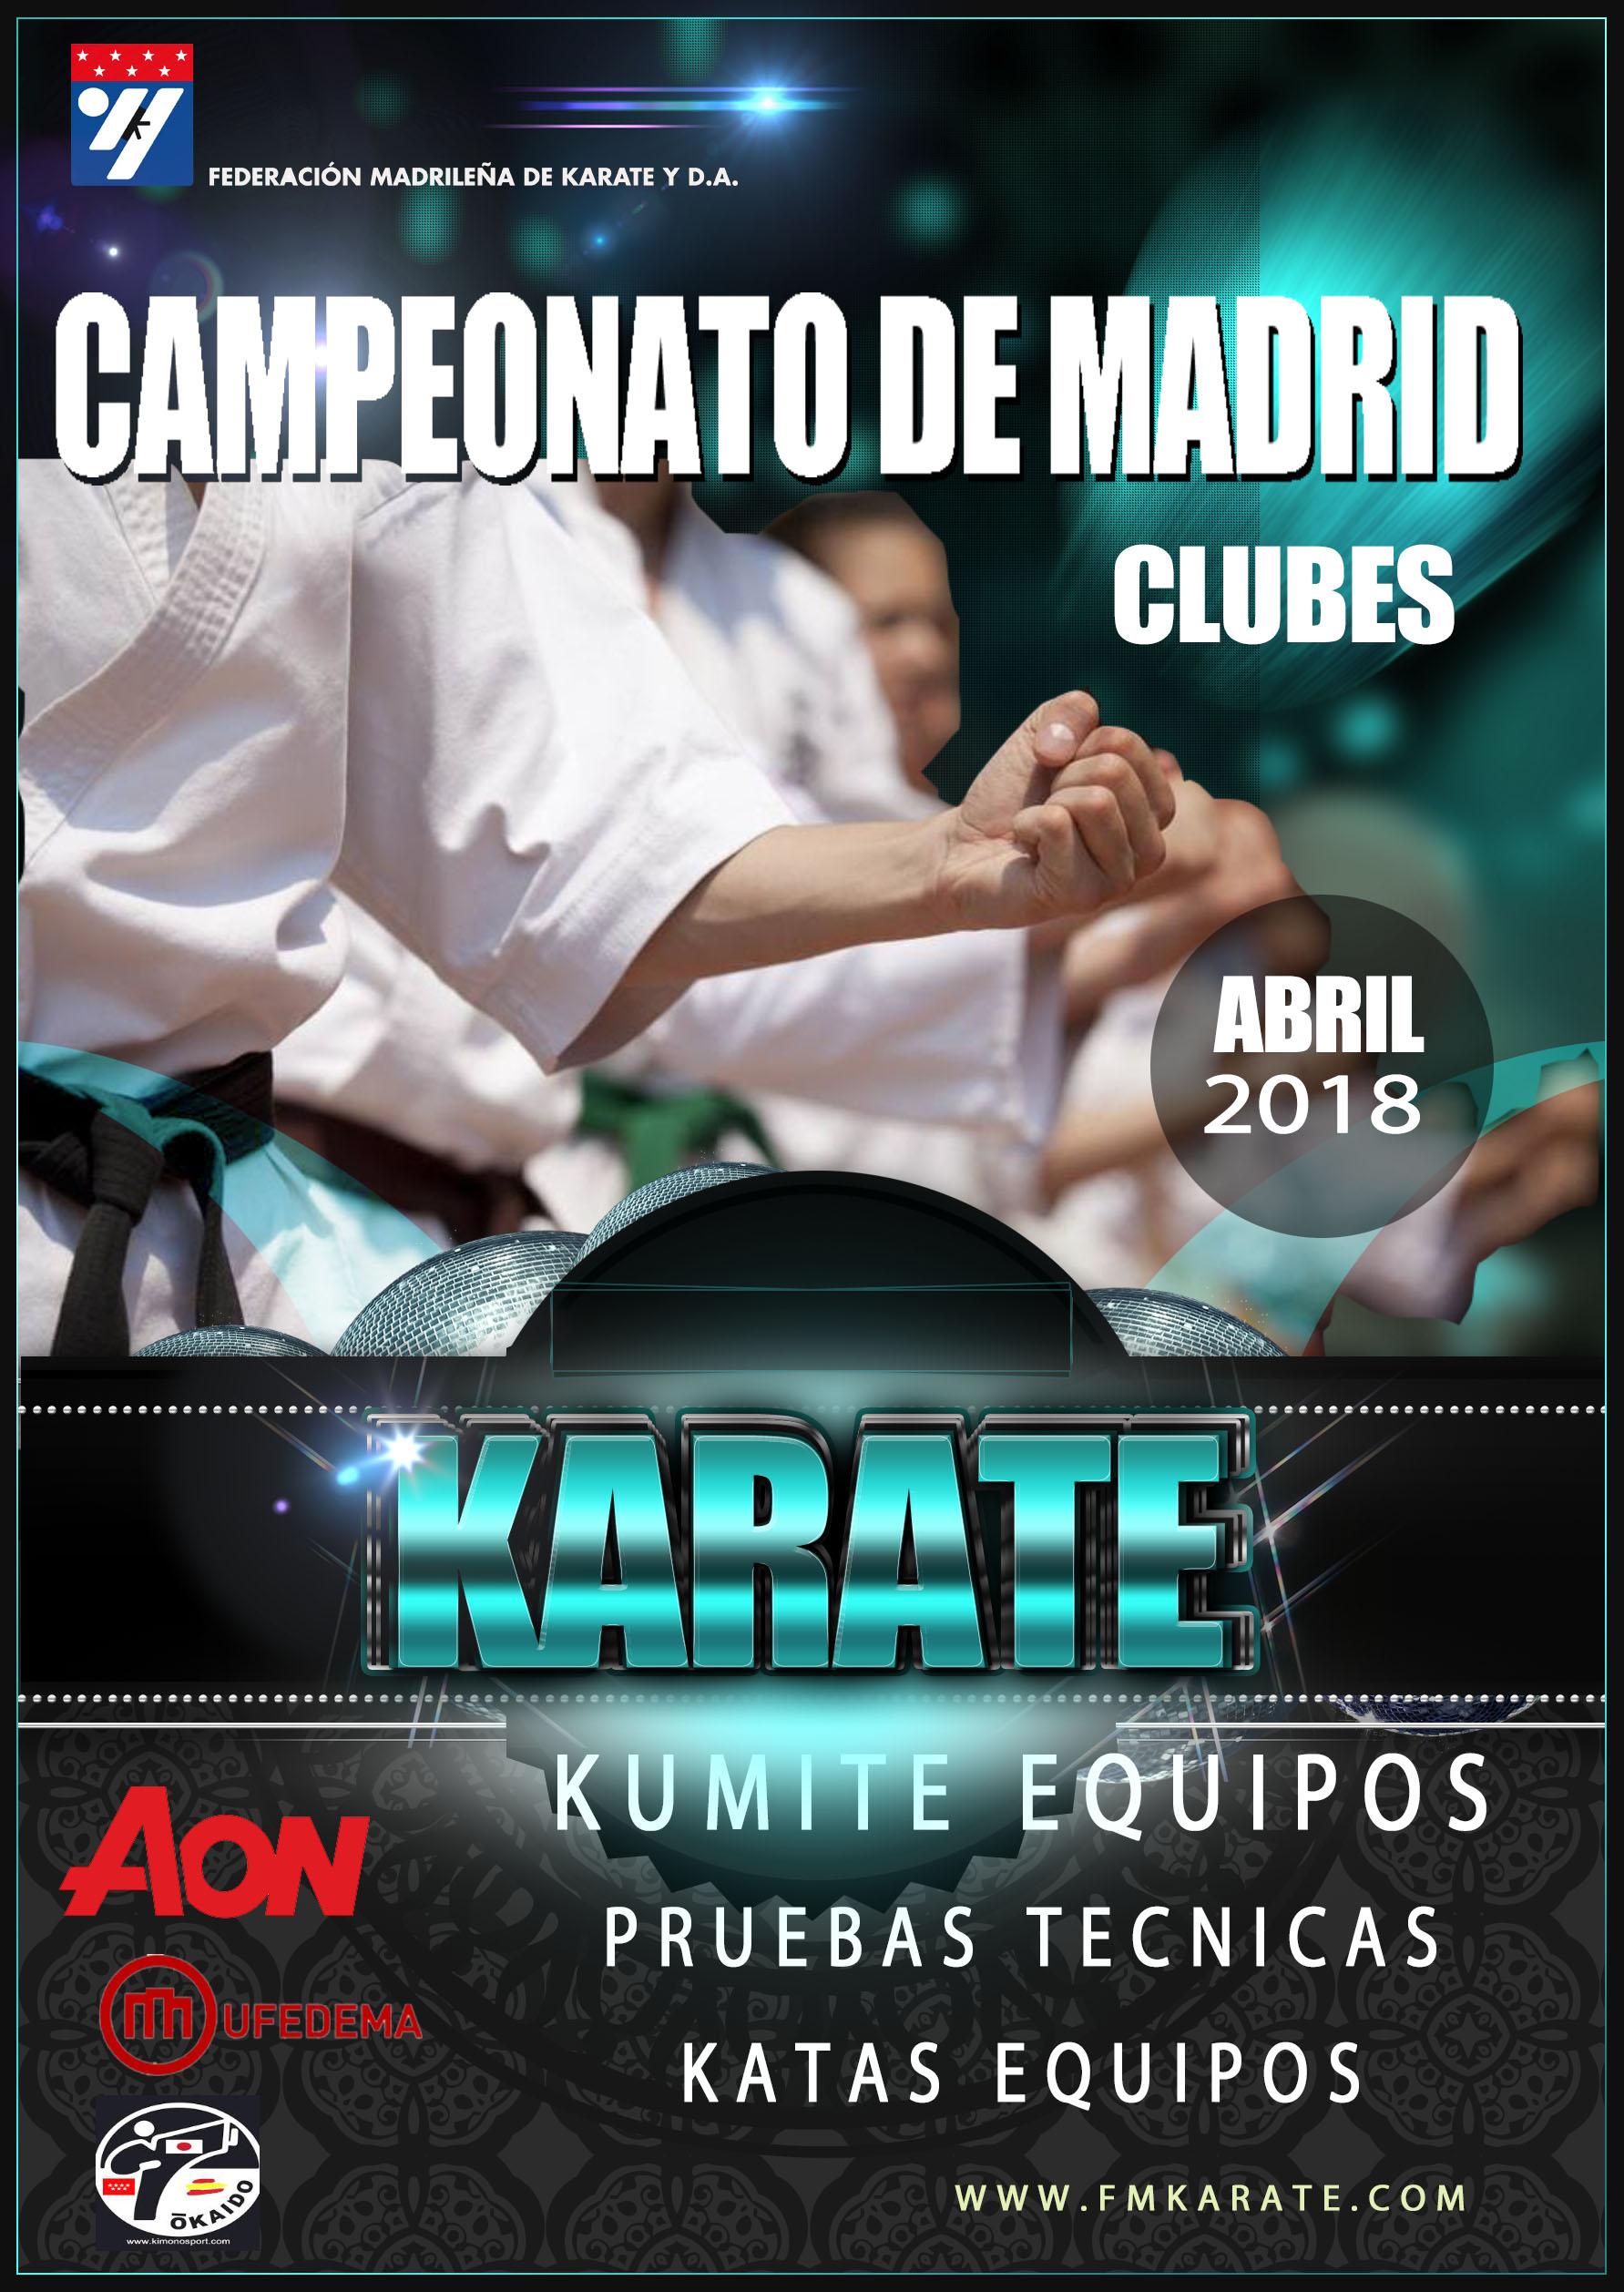 Campeonato de Madrid - Clubes 2018